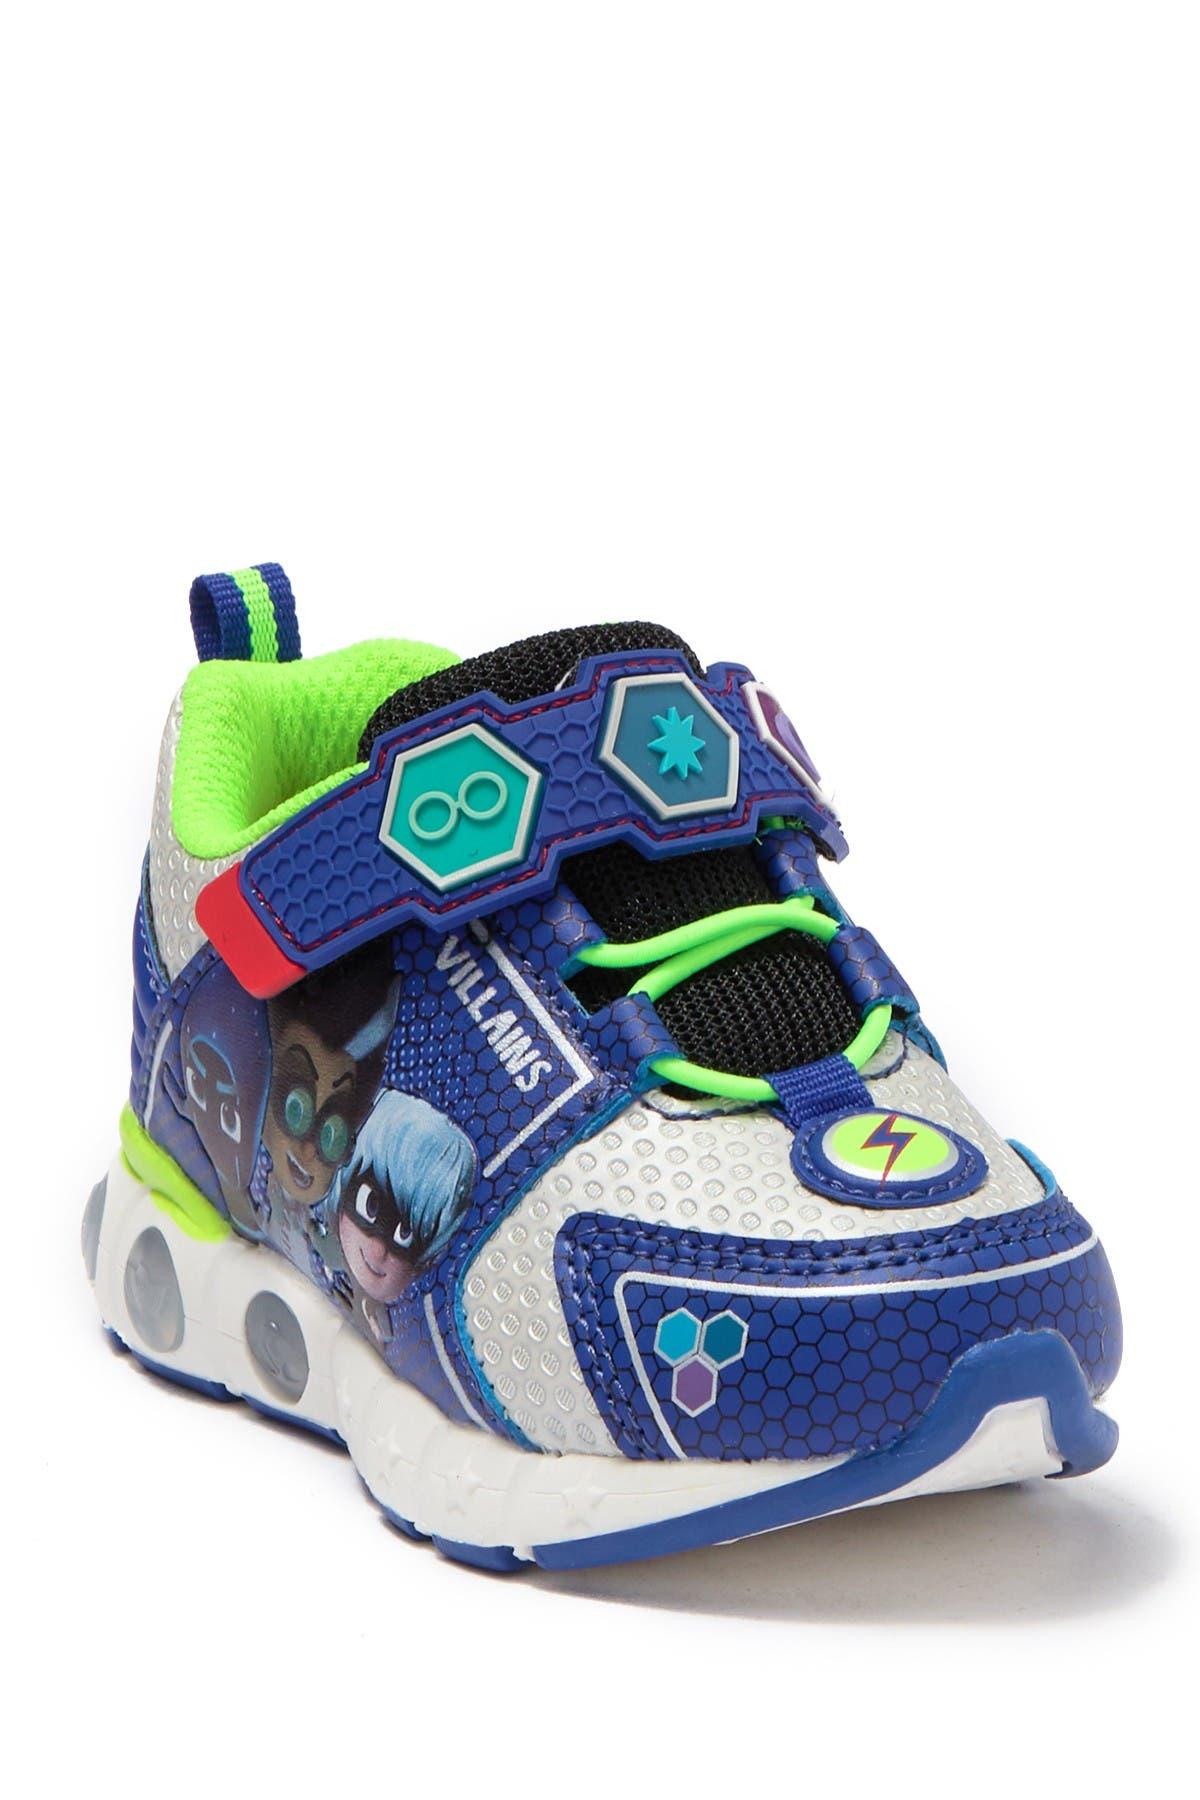 nordstrom light up shoes